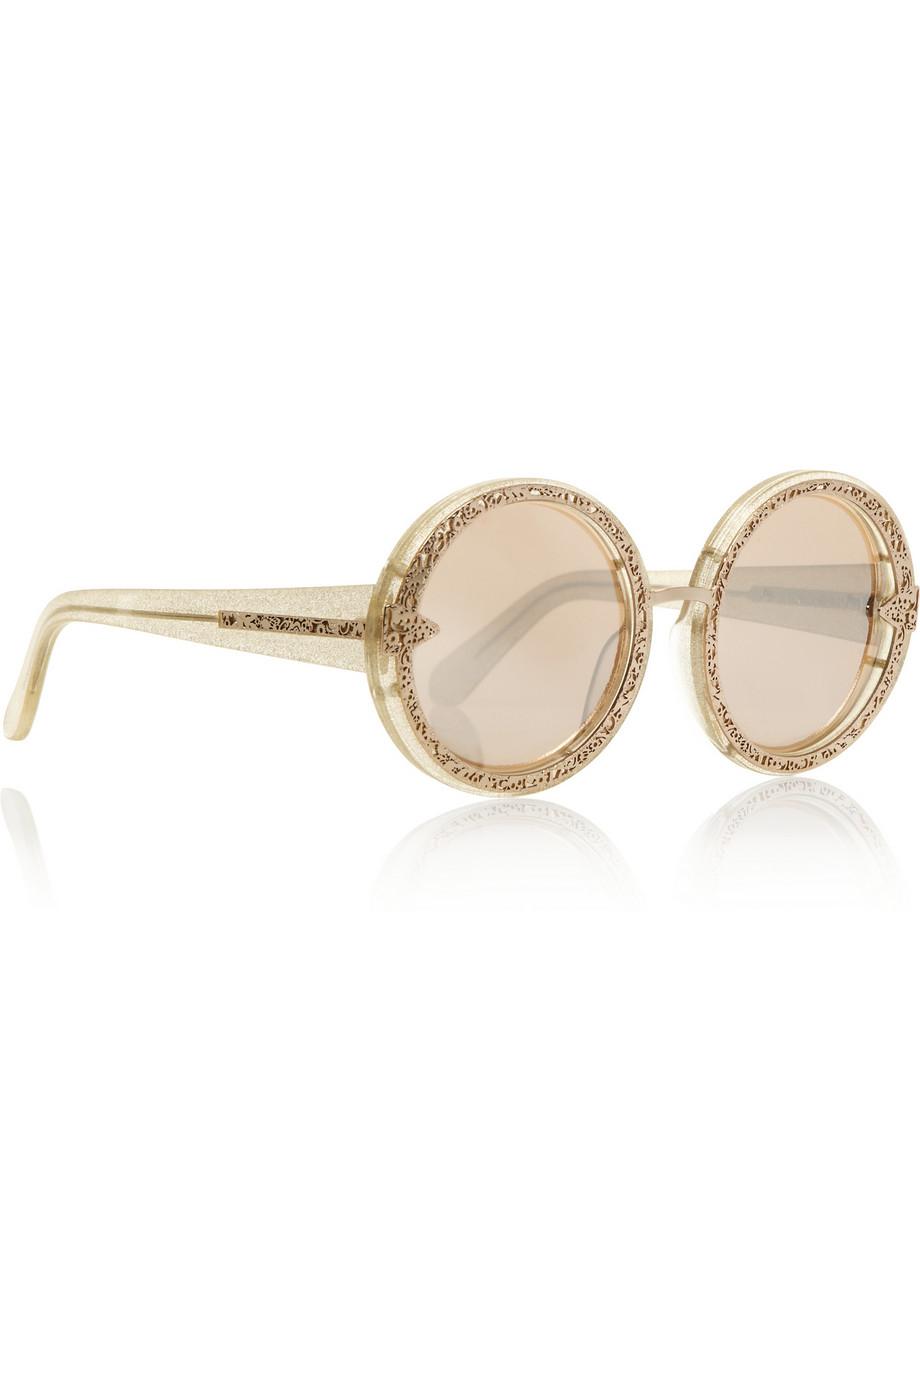 396192300ce1 Lyst - Karen Walker Gold Orbit Filigree Sunglasses in Metallic